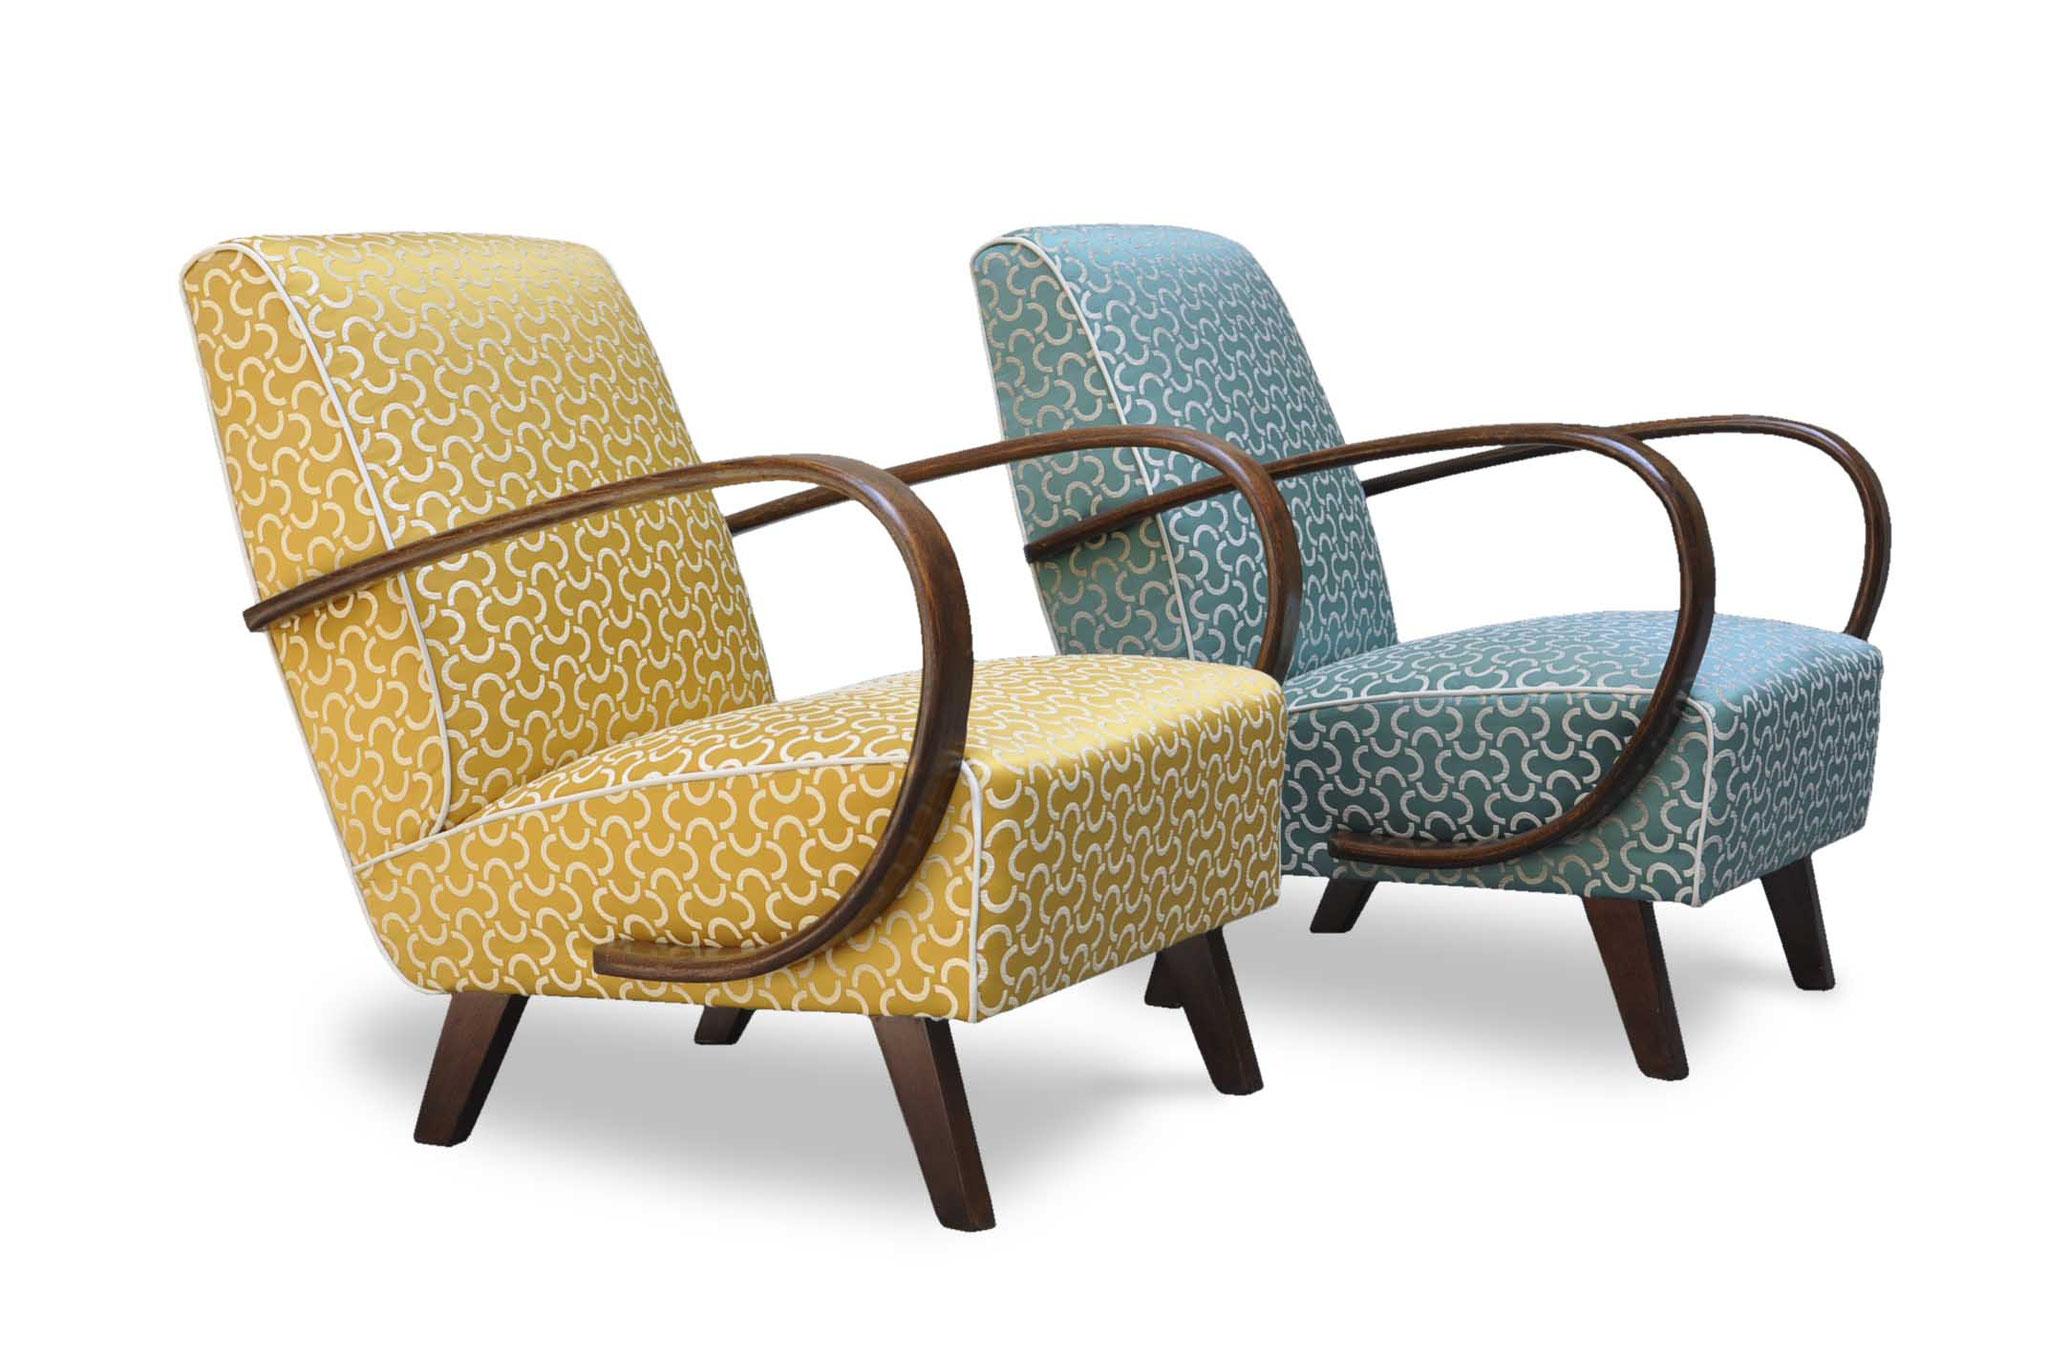 art deco chair in jacquard fabric